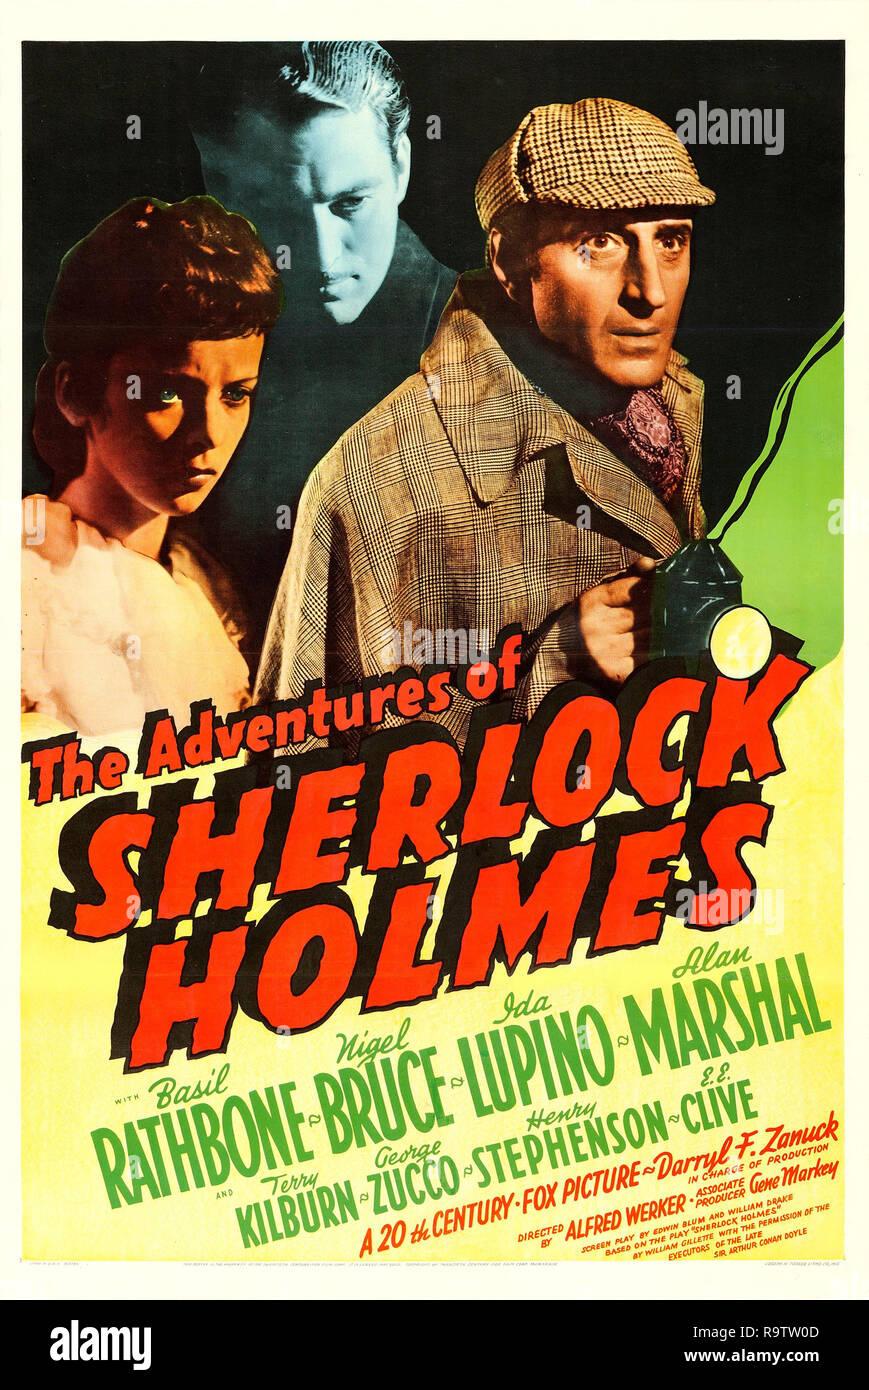 The Adventures of Sherlock Holmes (20th Century Fox, 1939). Poster  Bail Rathbone, Ida Lupino File Reference # 33635_920THA - Stock Image